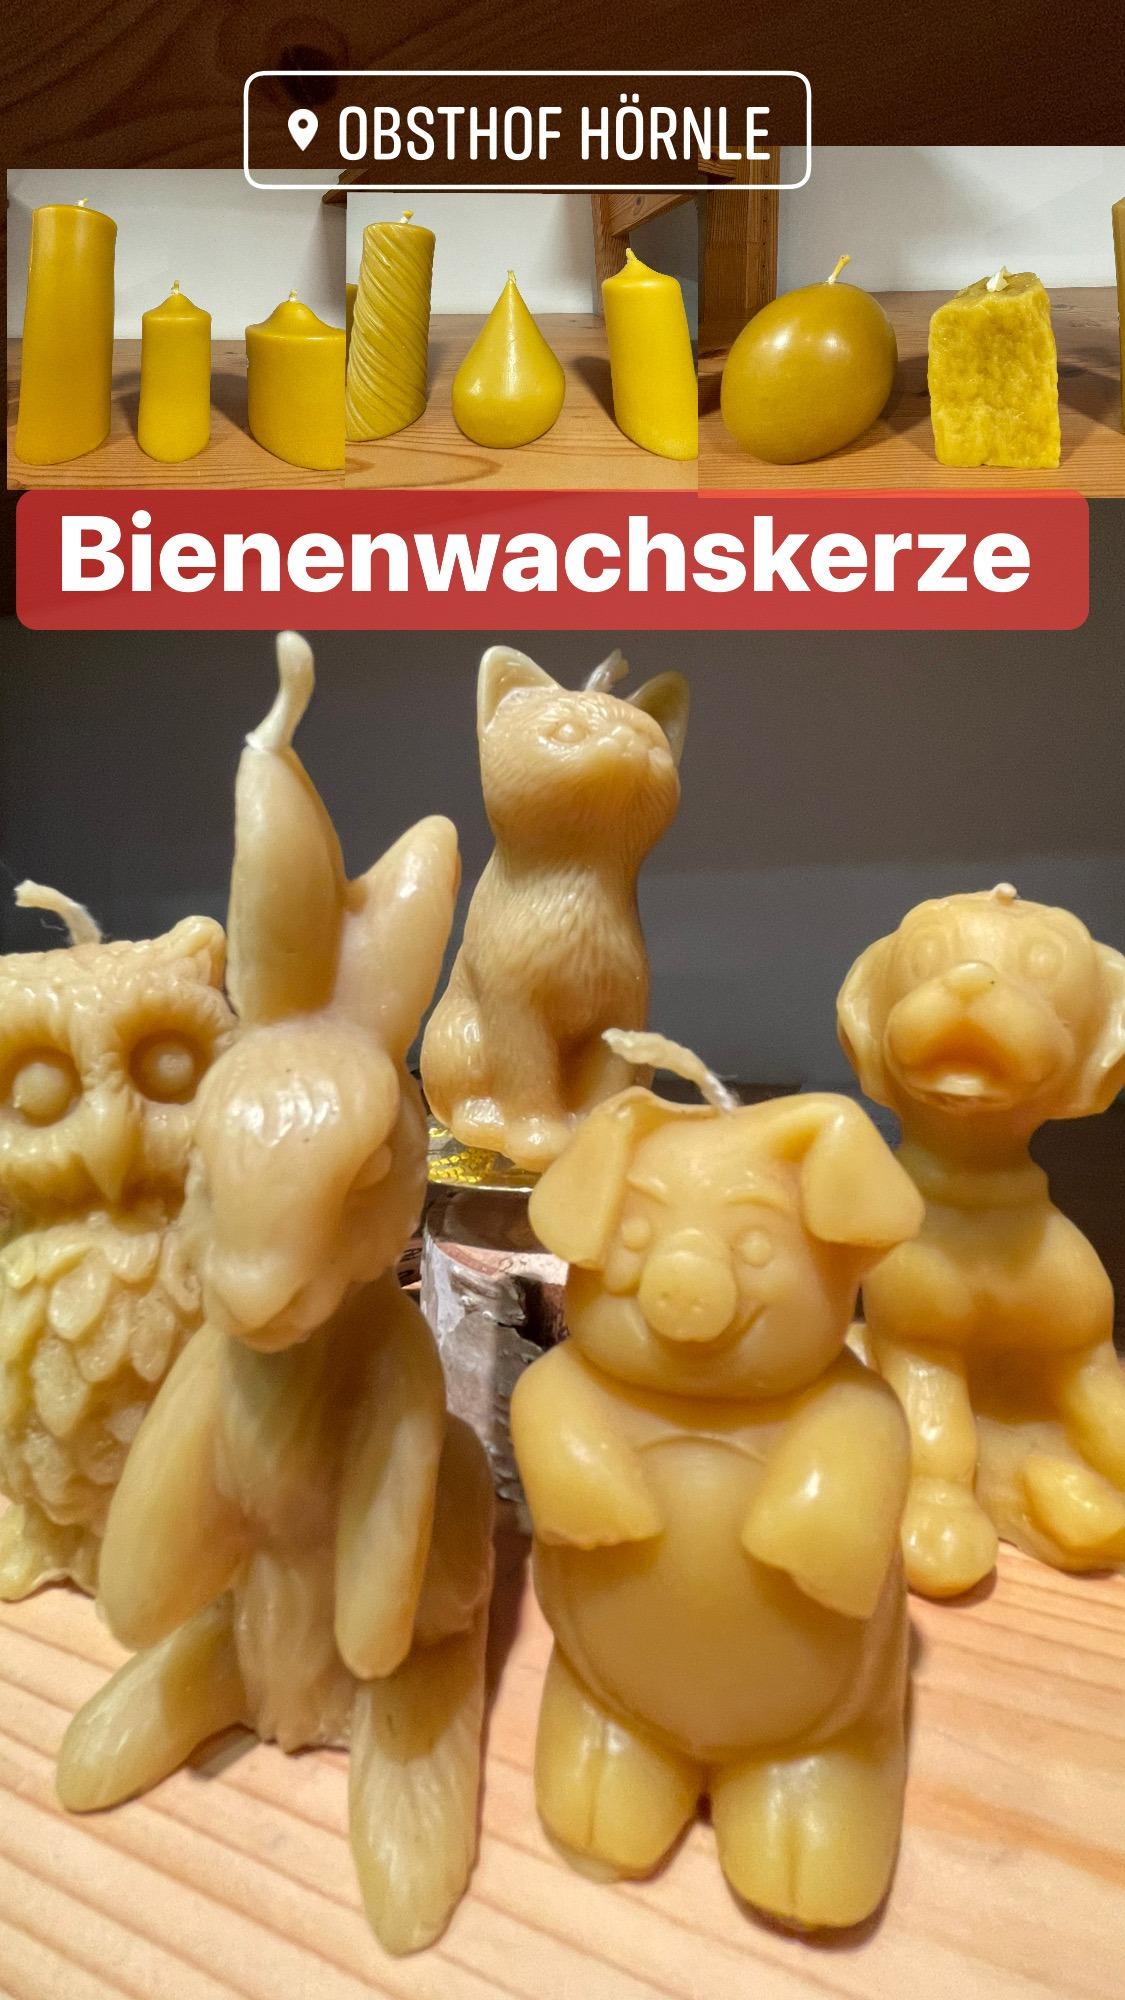 Read more about the article Bienenwachskerzen